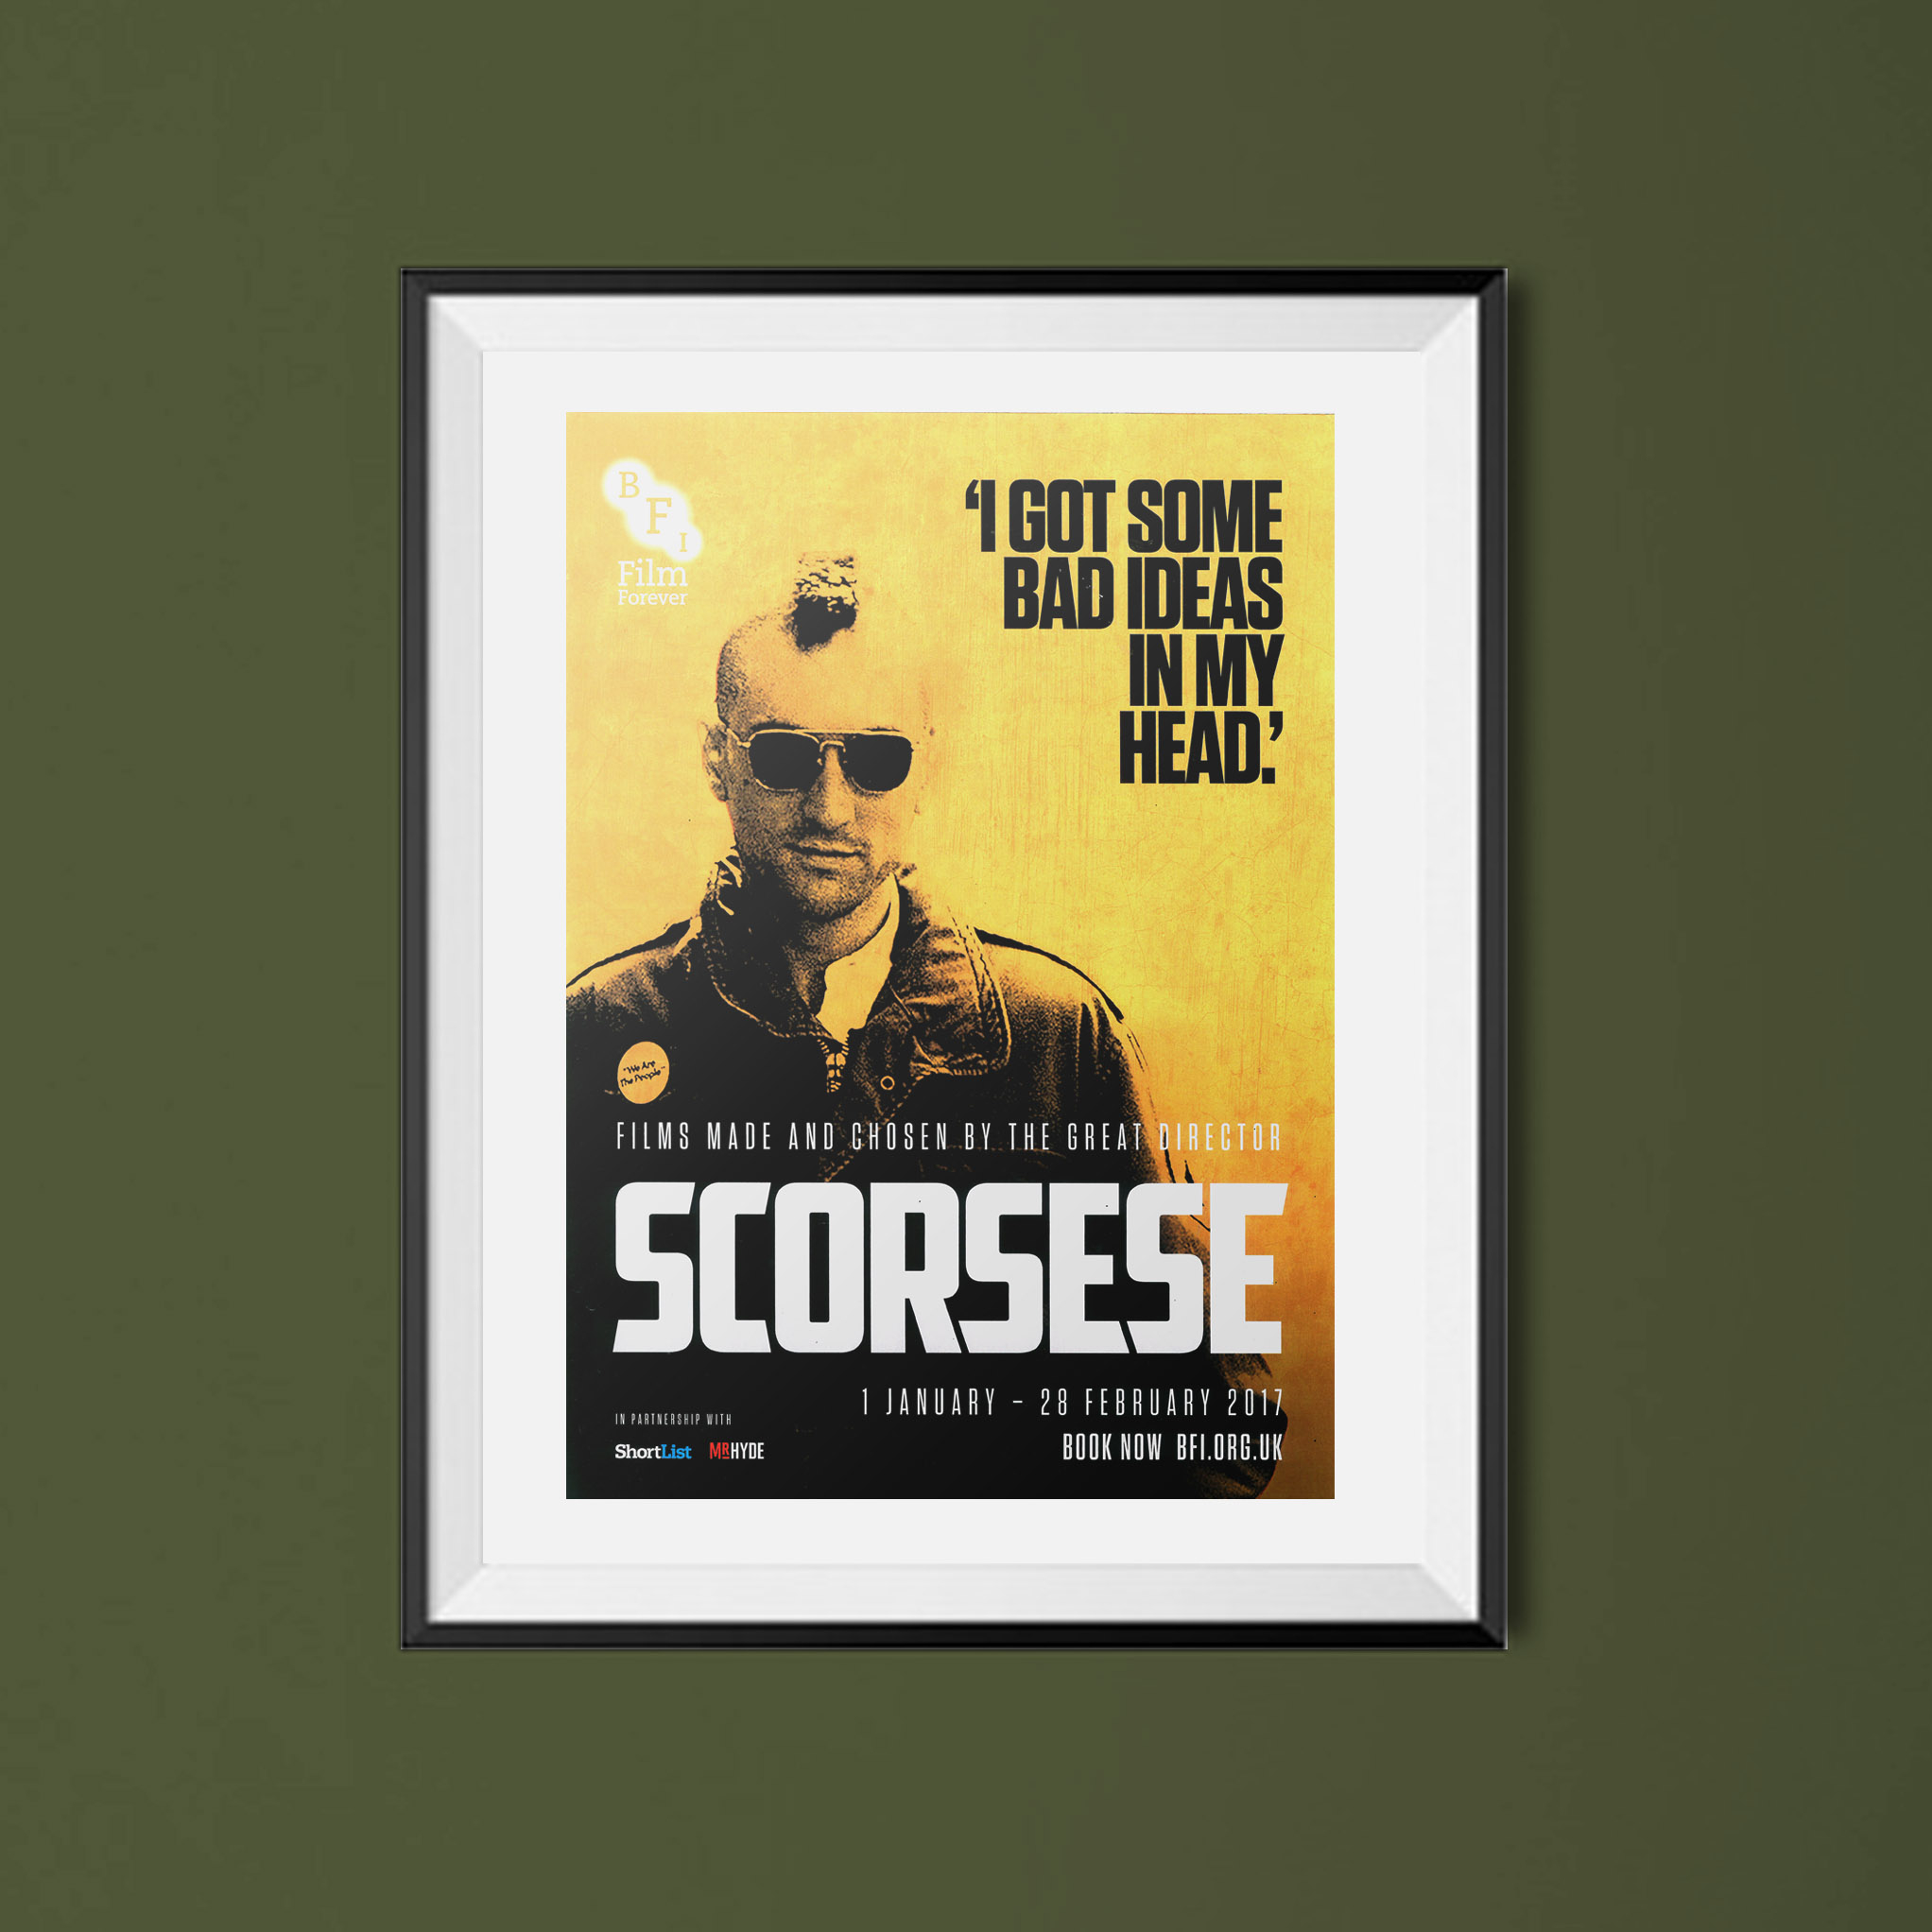 Buy Scorsese BFI season poster